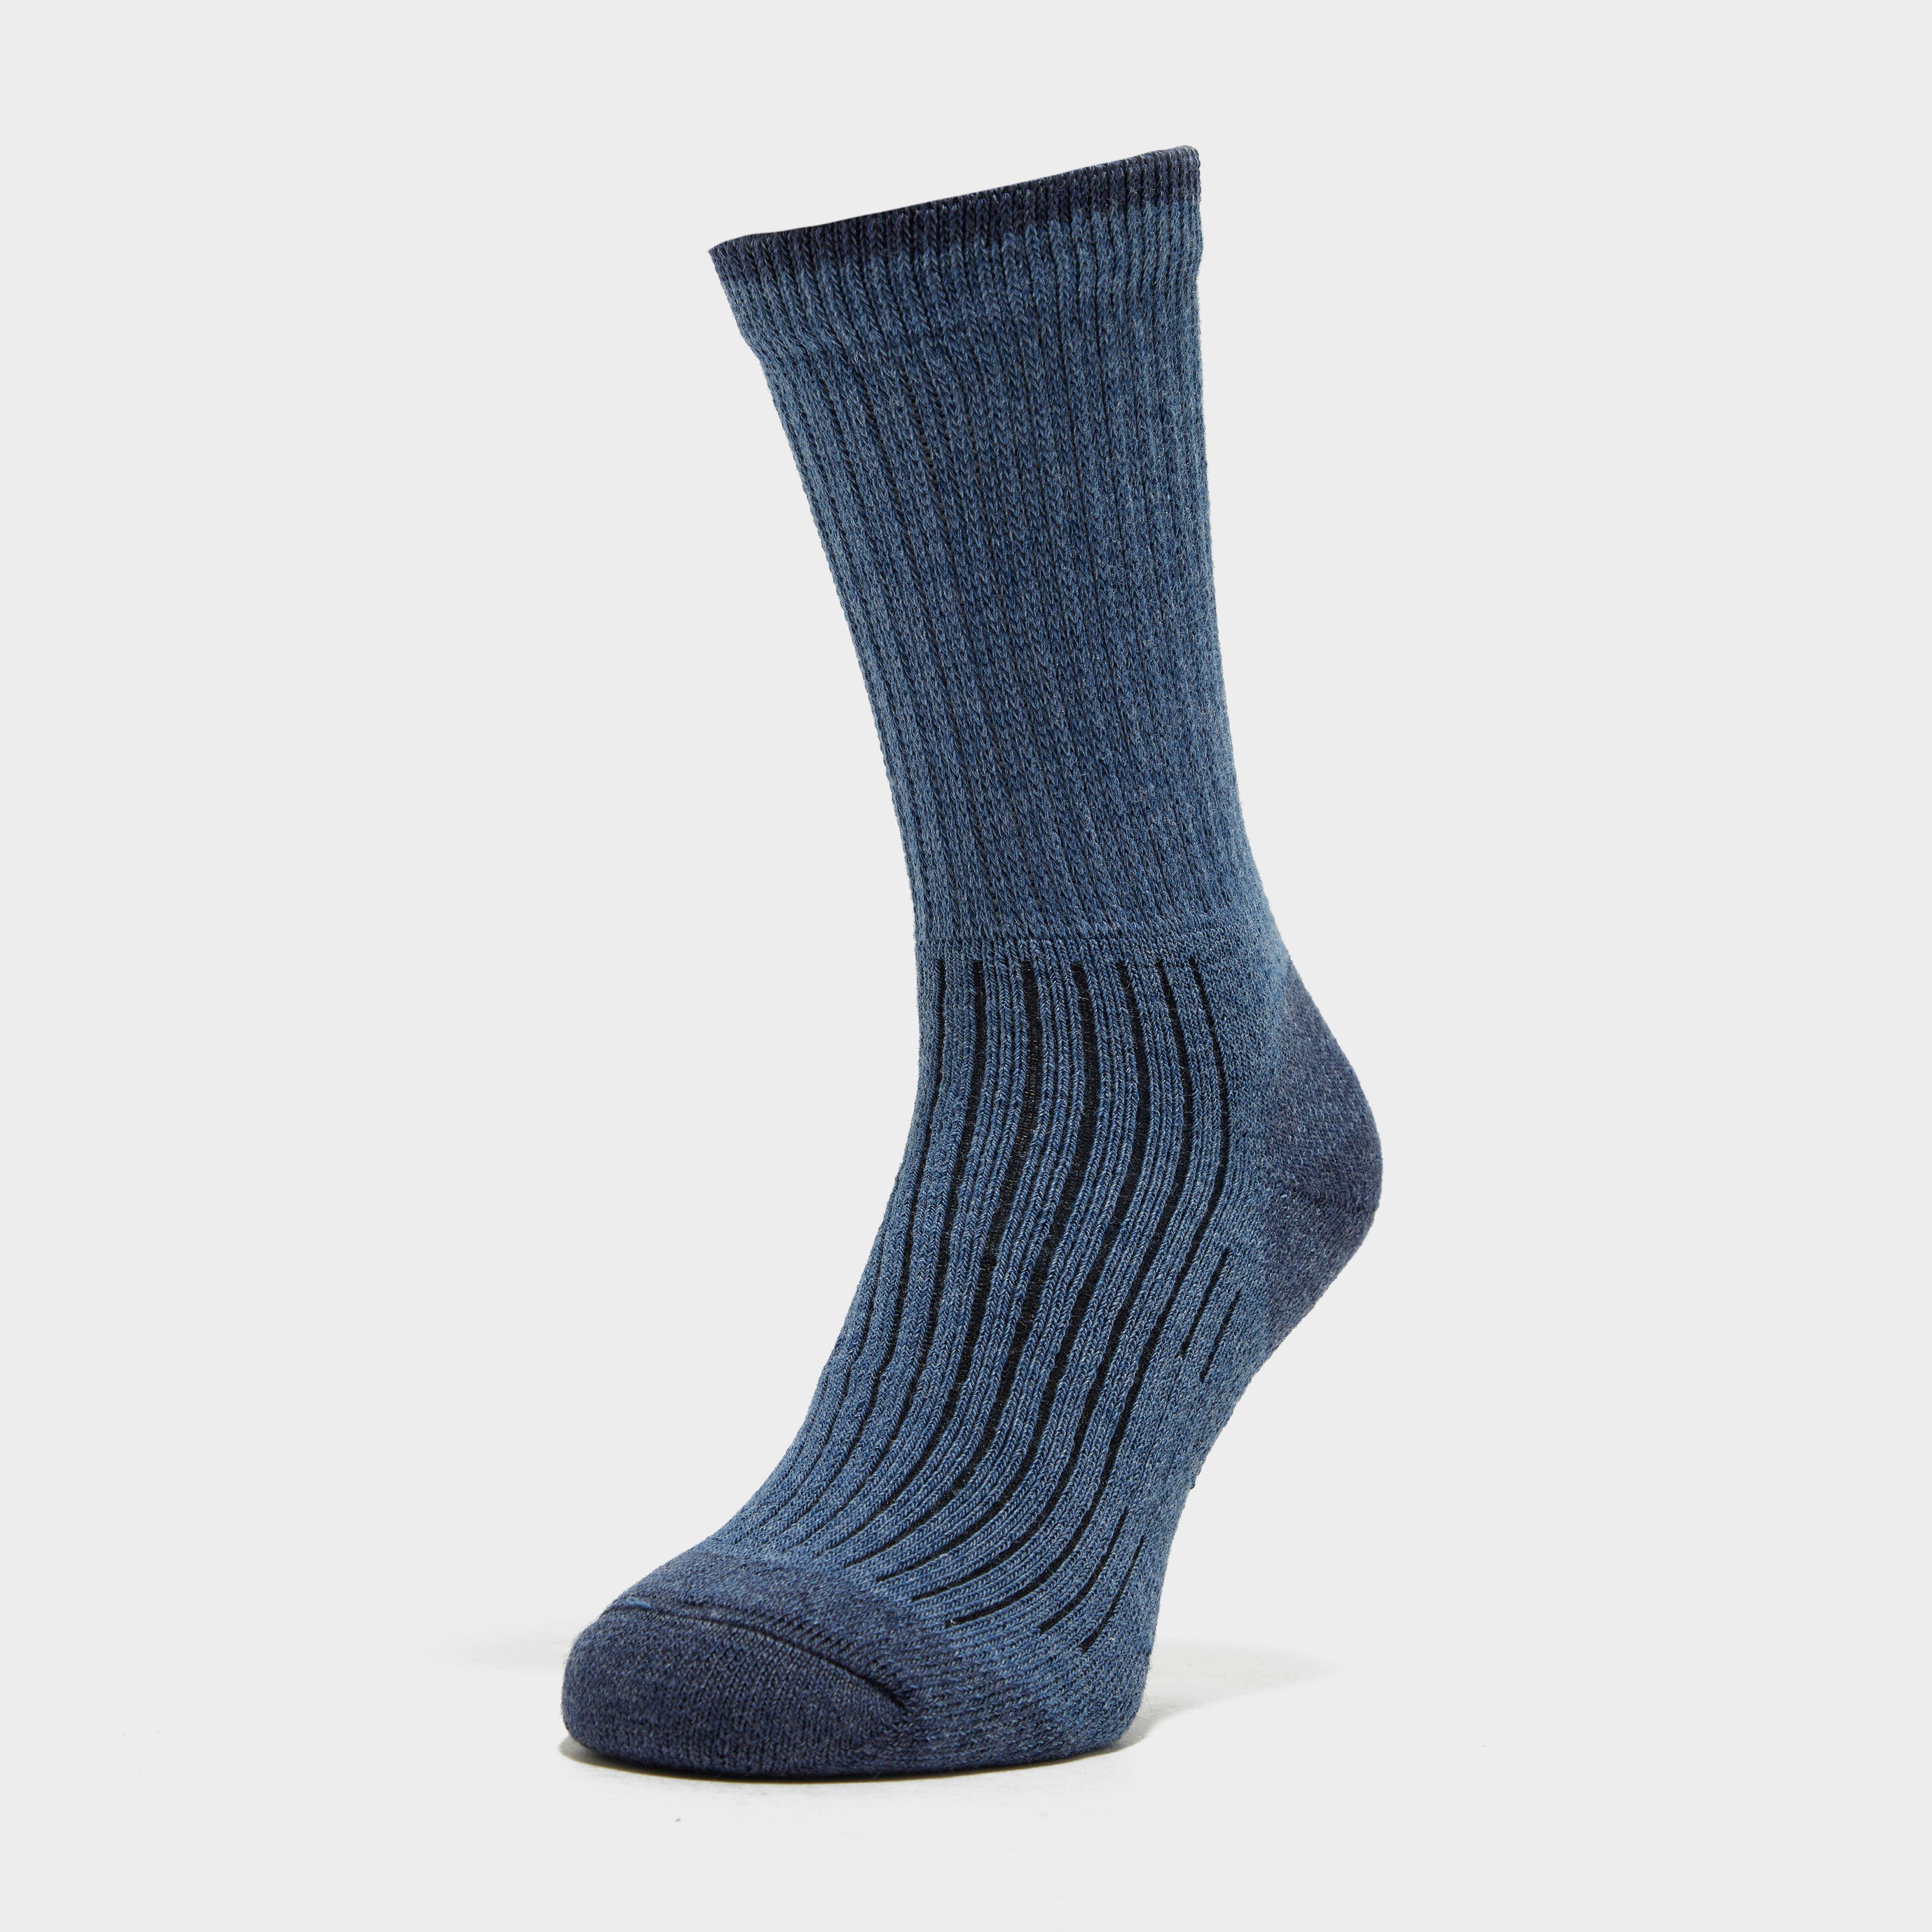 Brasher Womens Hiker Socks - Blue/blue  Blue/blue